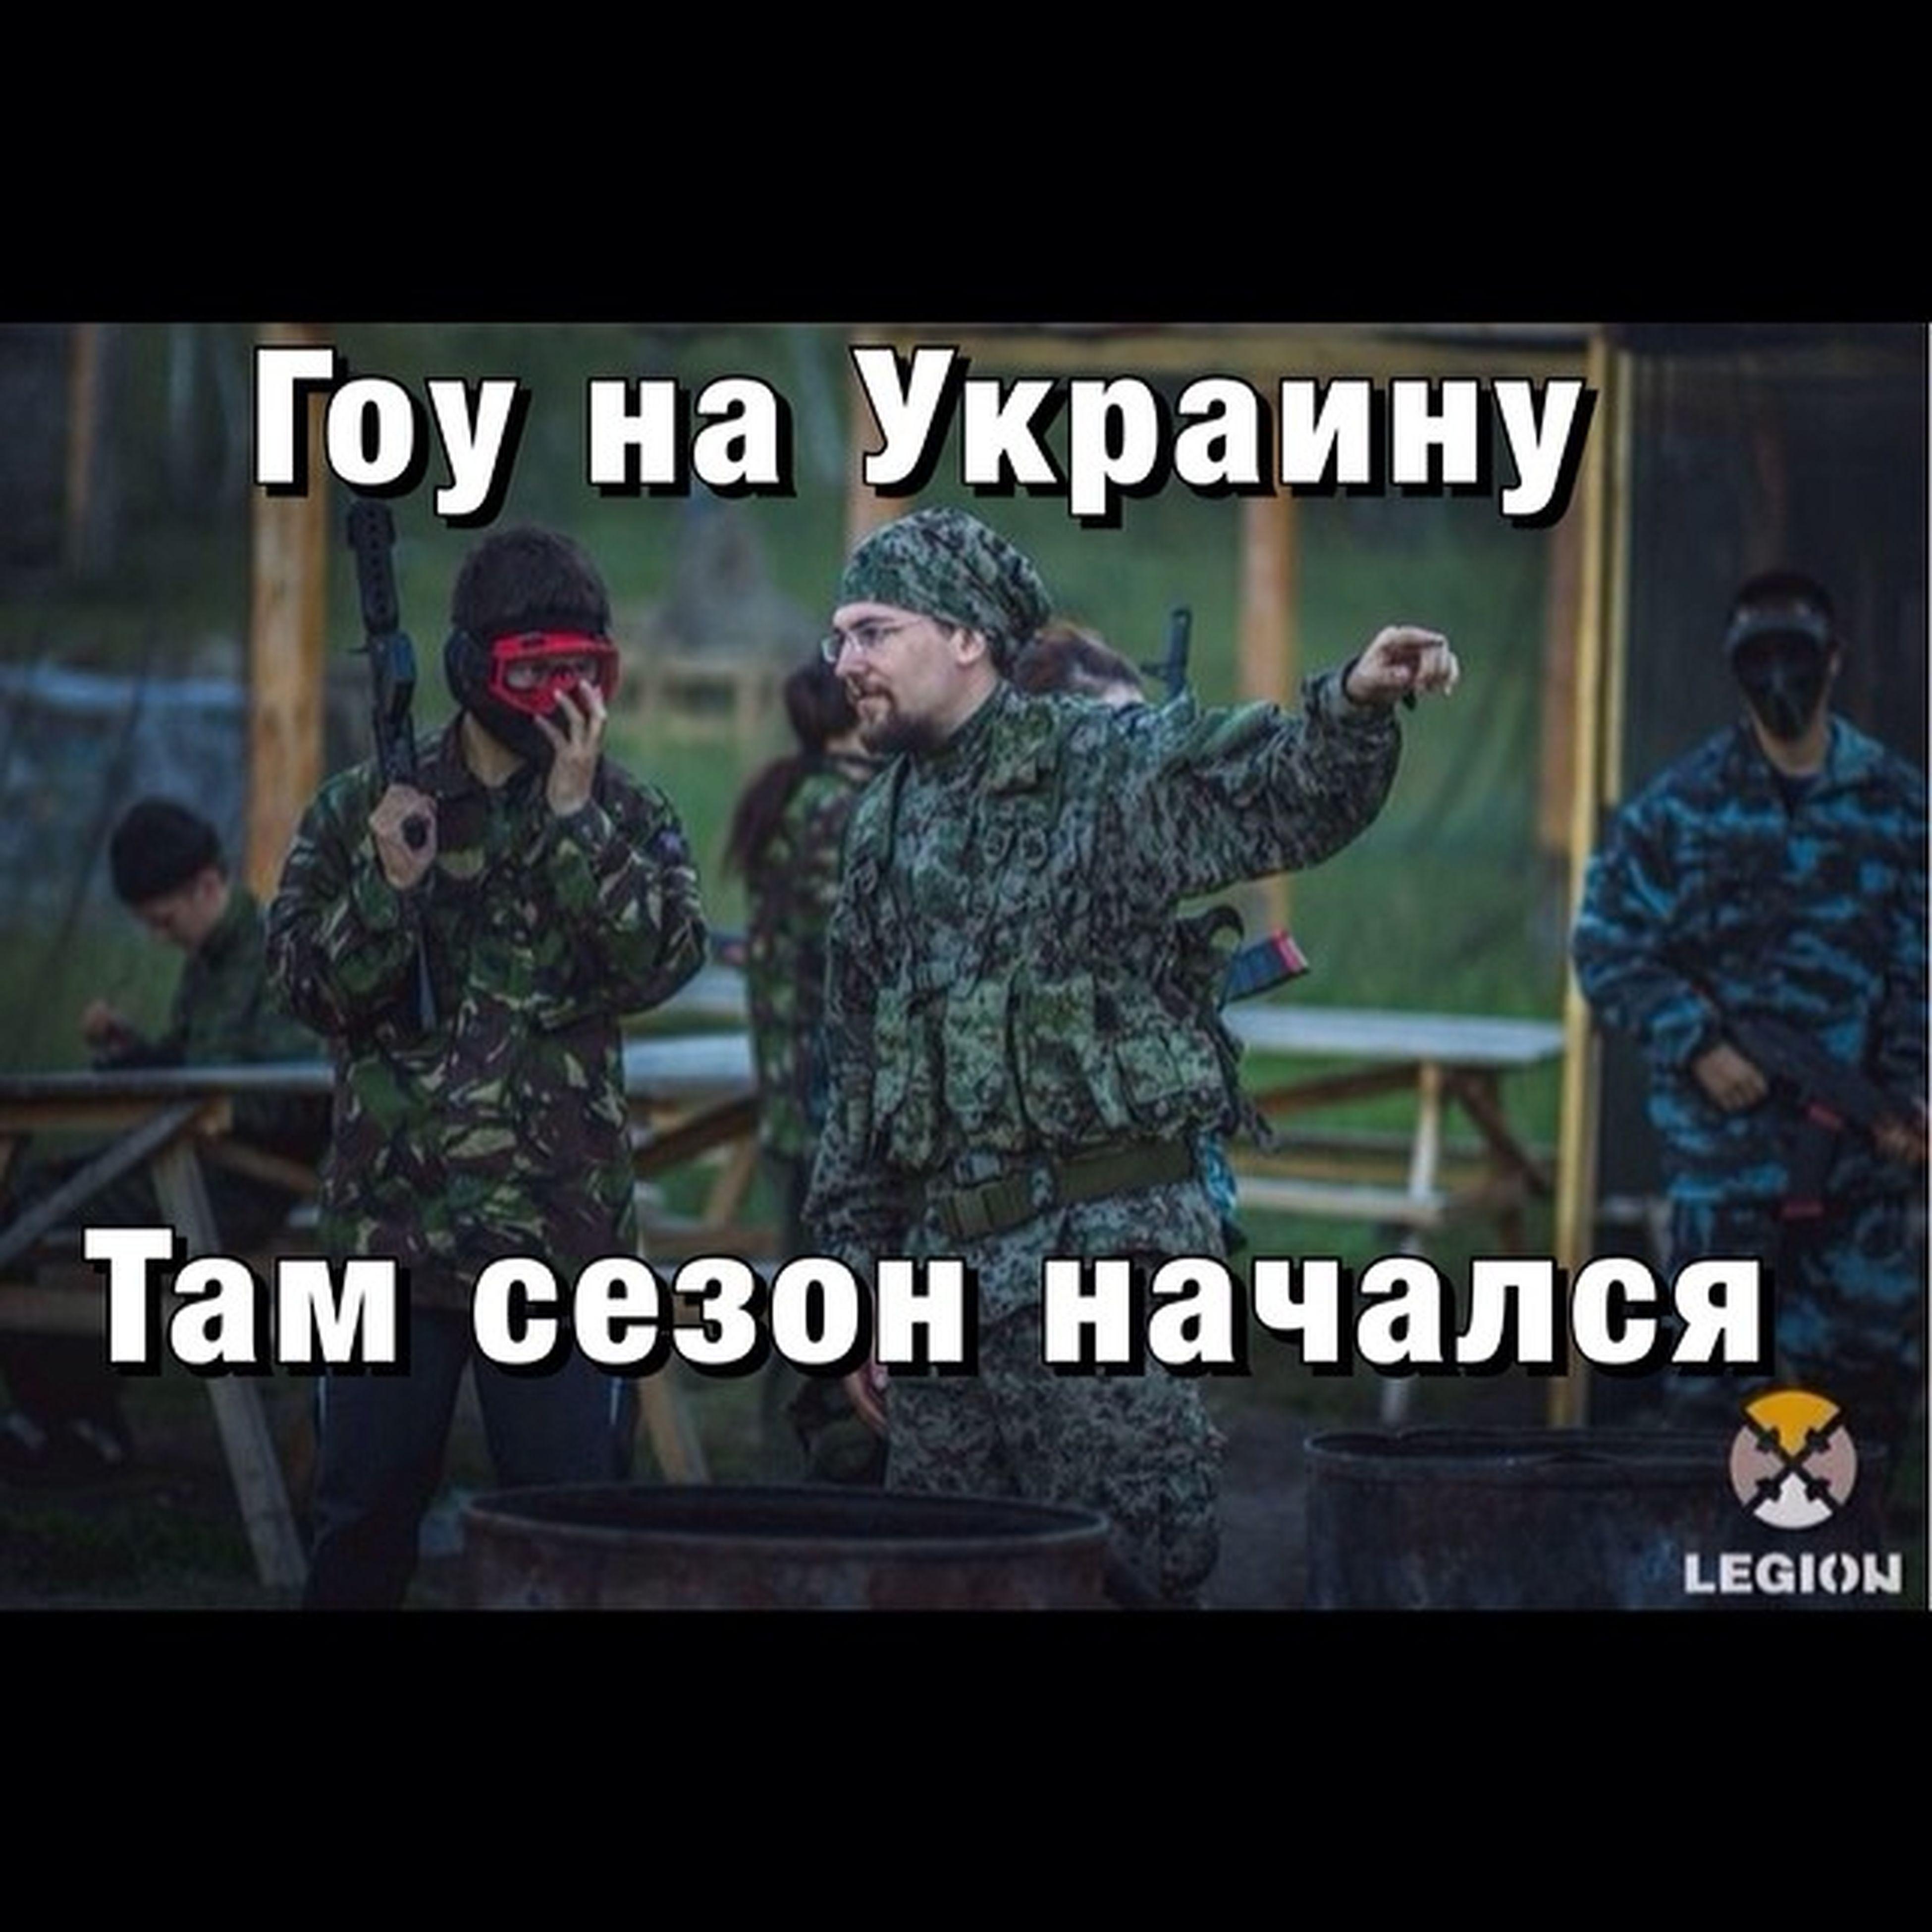 украина страйкбол Srikeball Instaykt airsift ykt lol russia ???